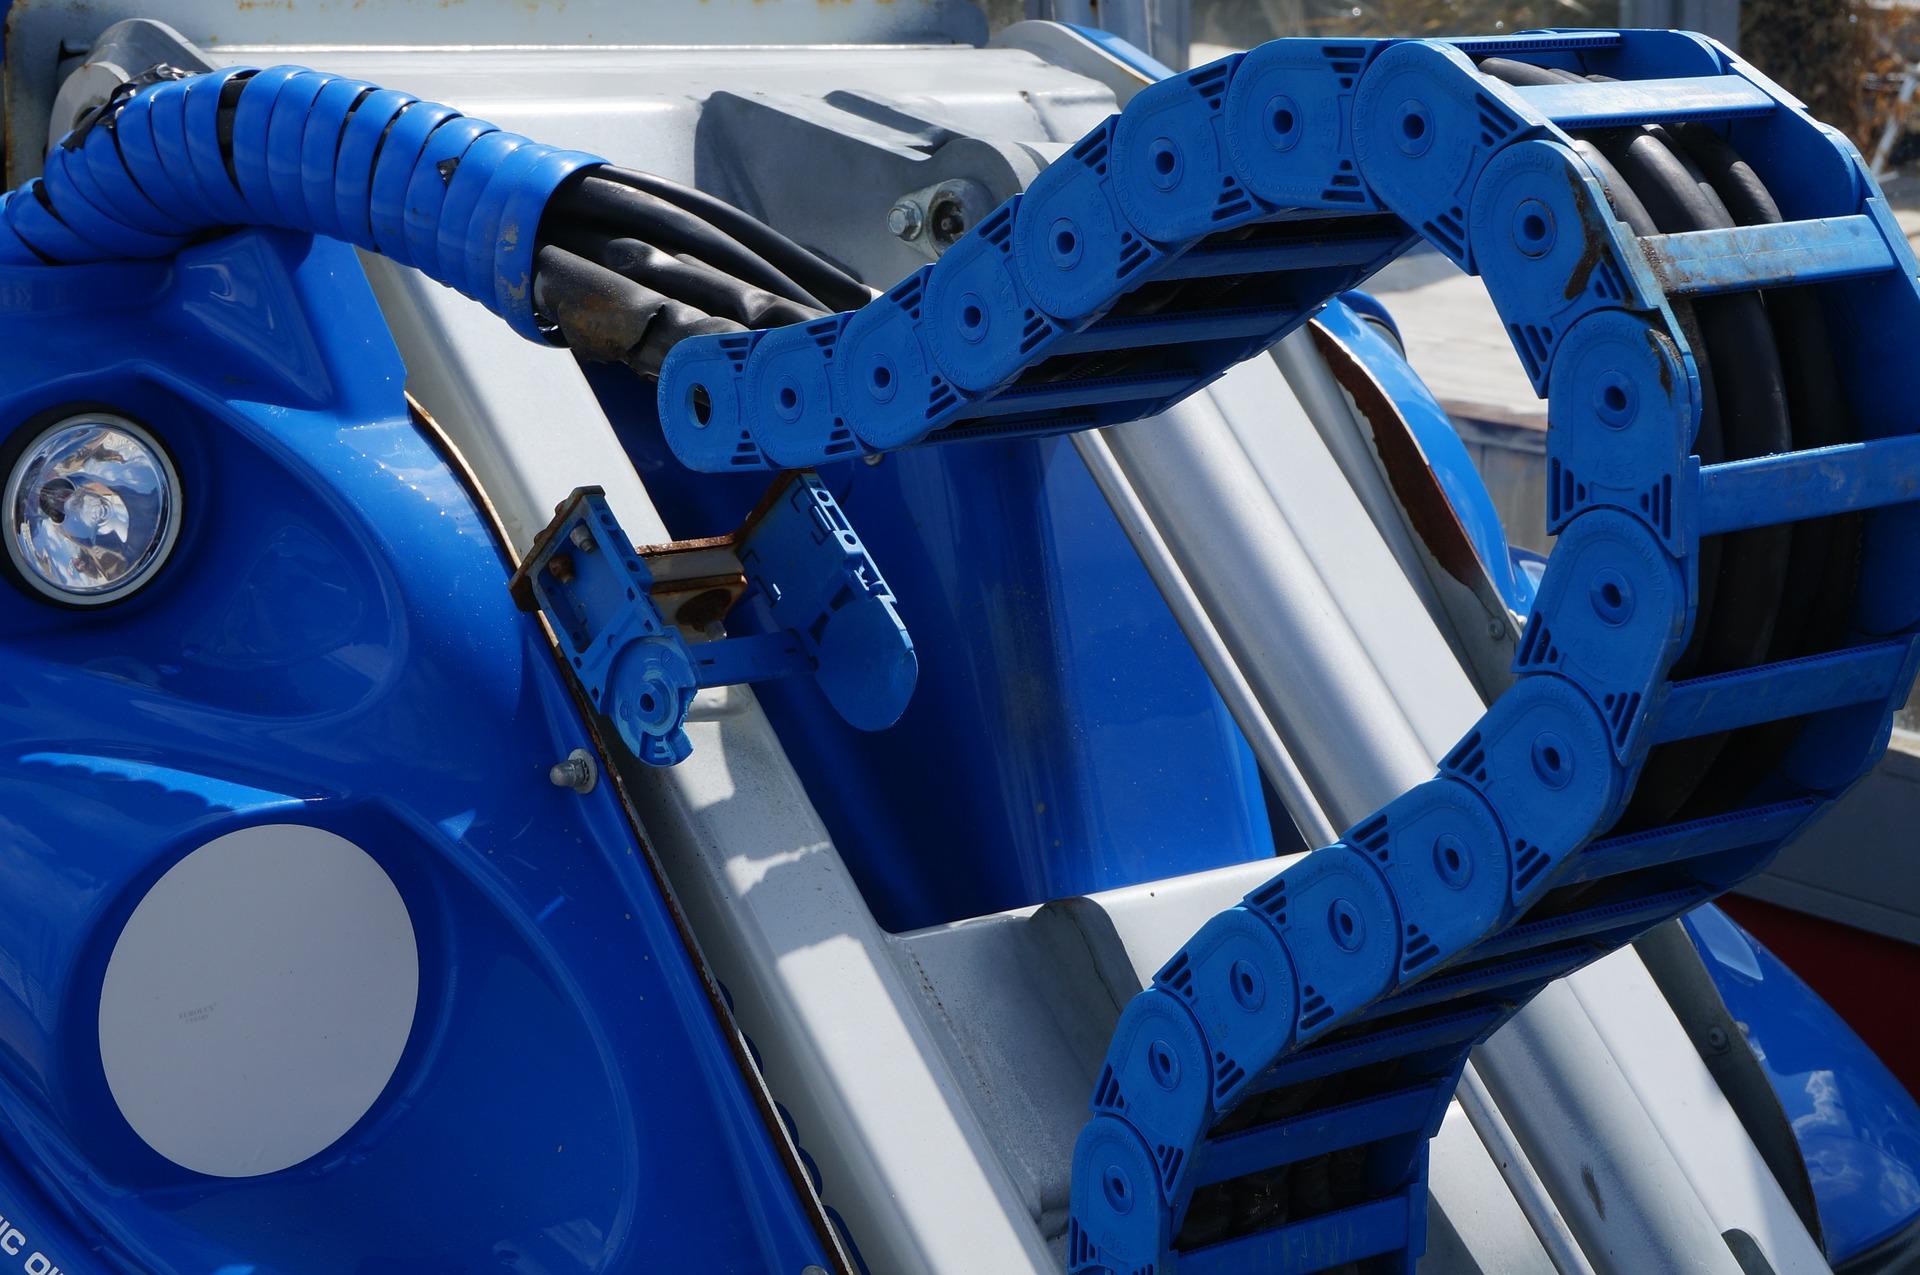 Firmenverkauf: Service+Handelsfirma Hydraulik/Pneumatik